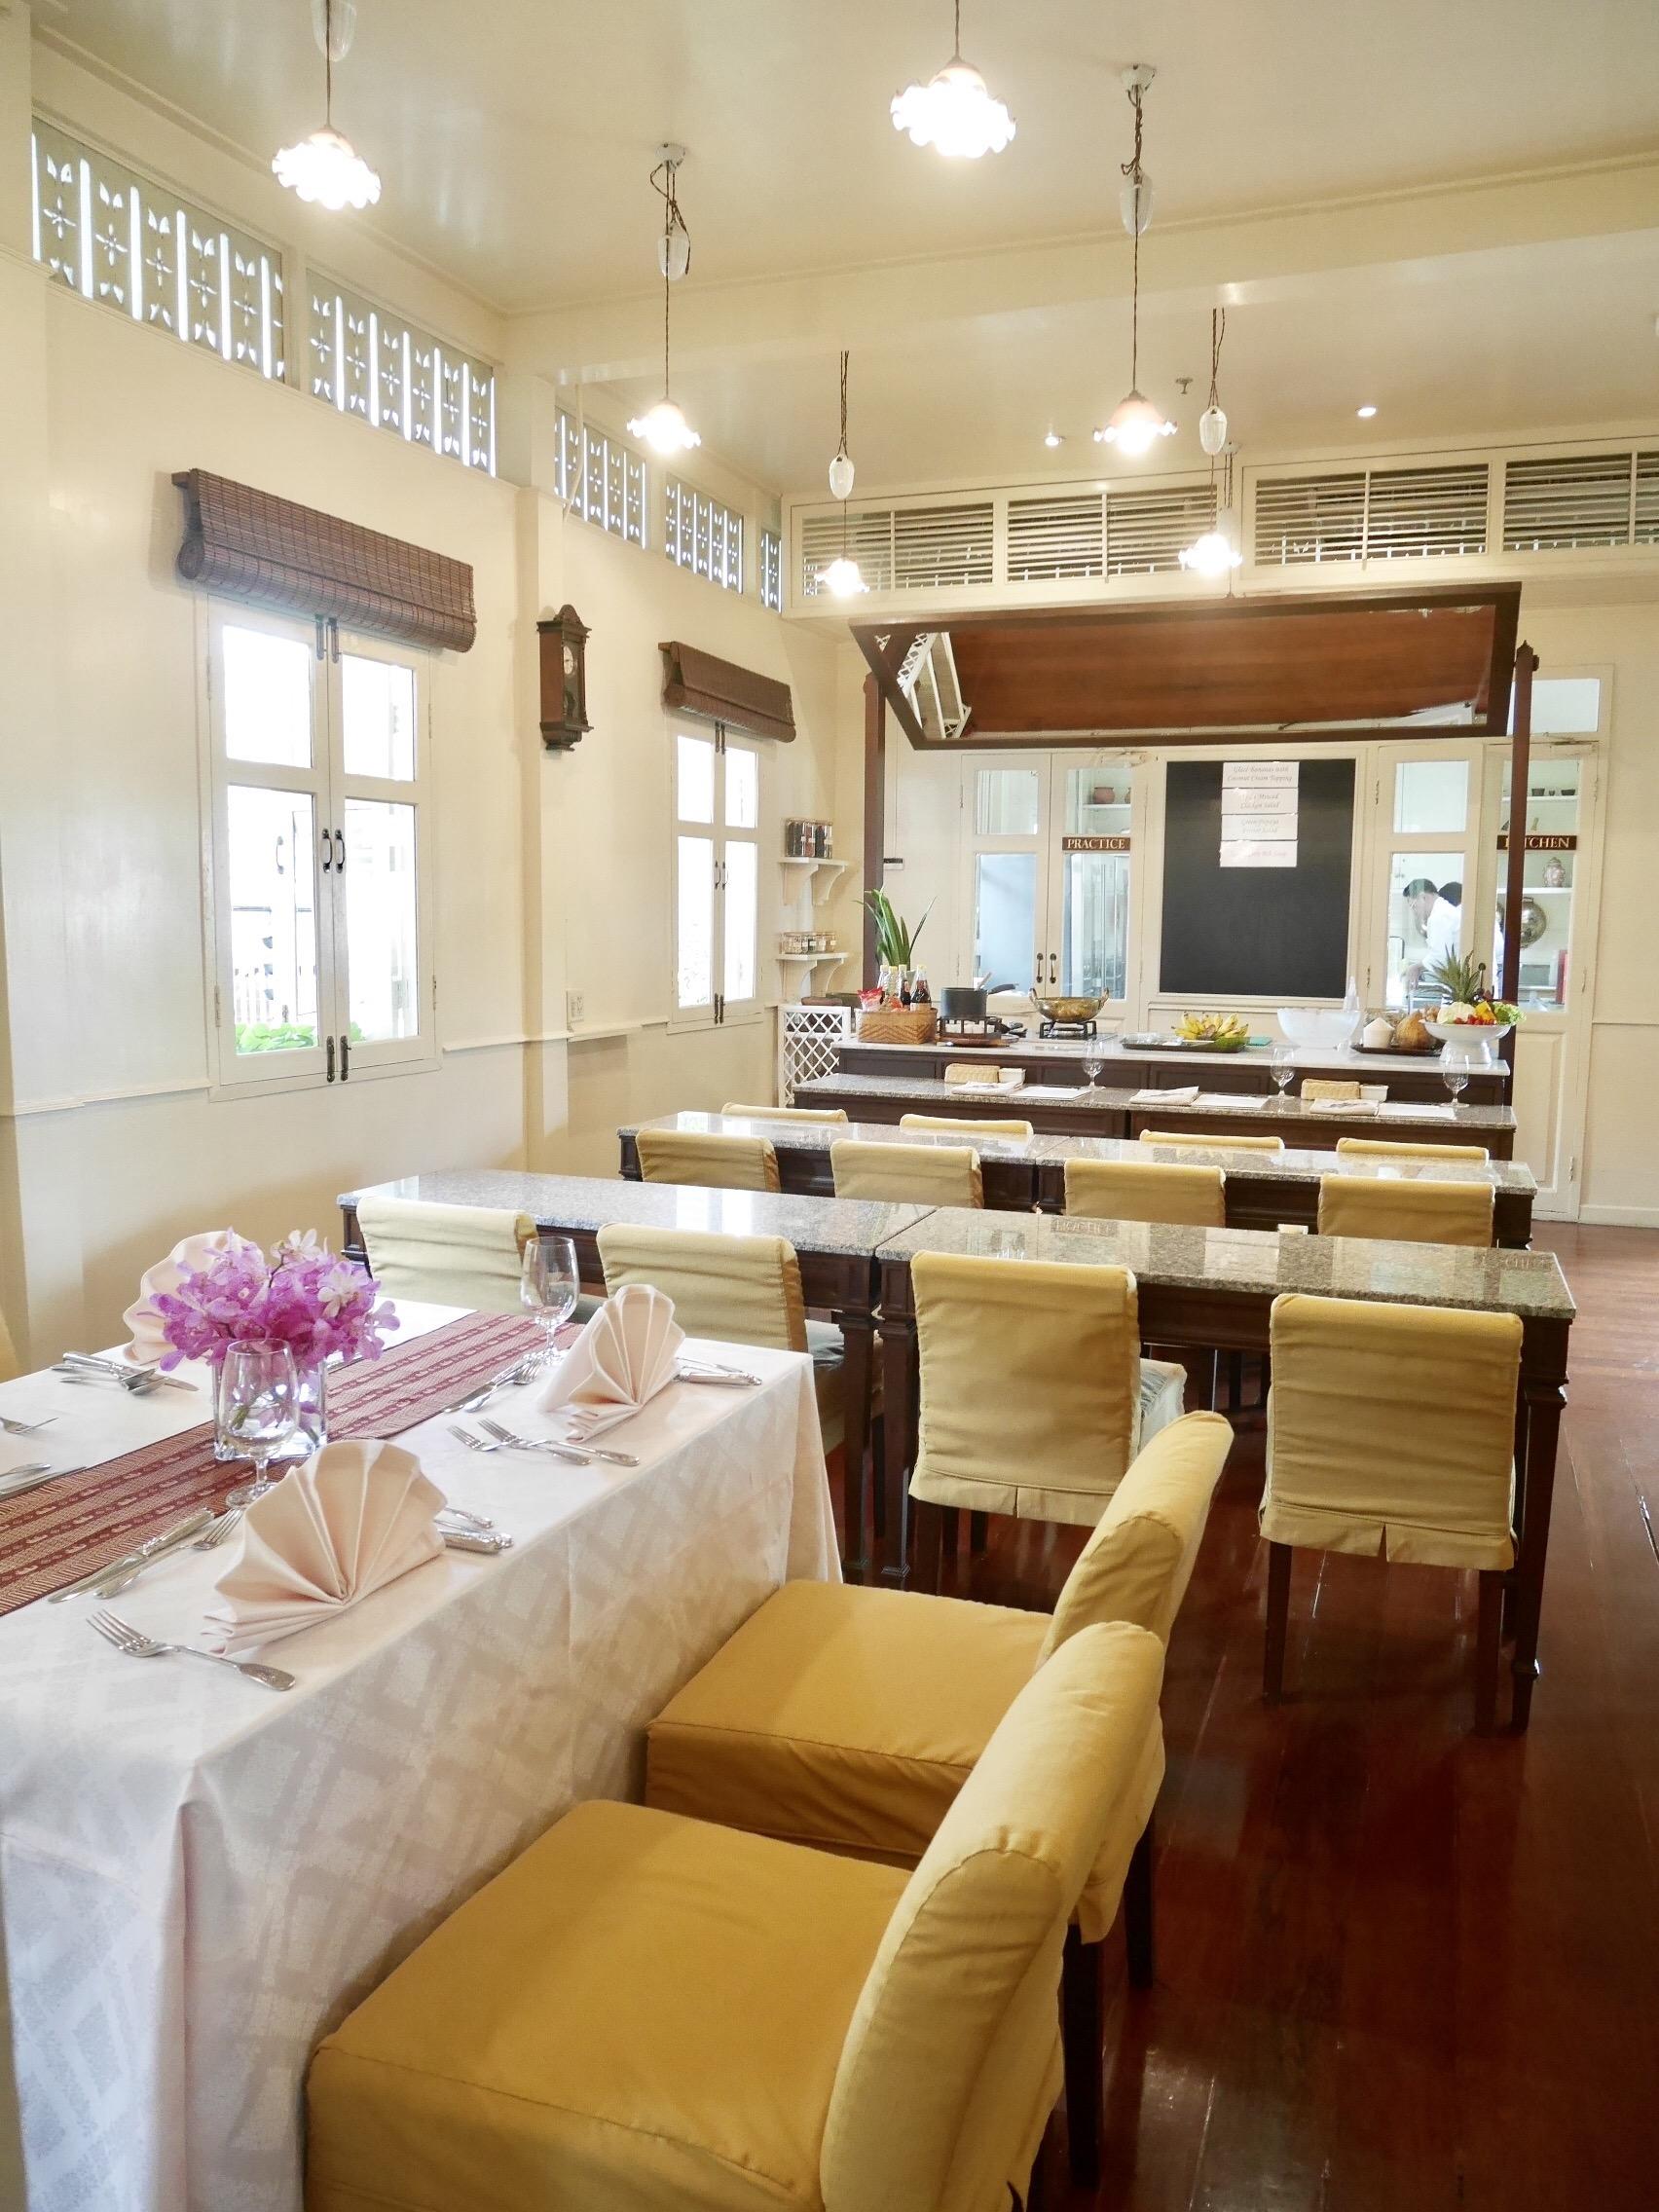 img 9107 - The Oriental Thai Cooking School - マンダリンオリエンタルバンコクのおもてなし空間で体験する絶品タイ料理教室